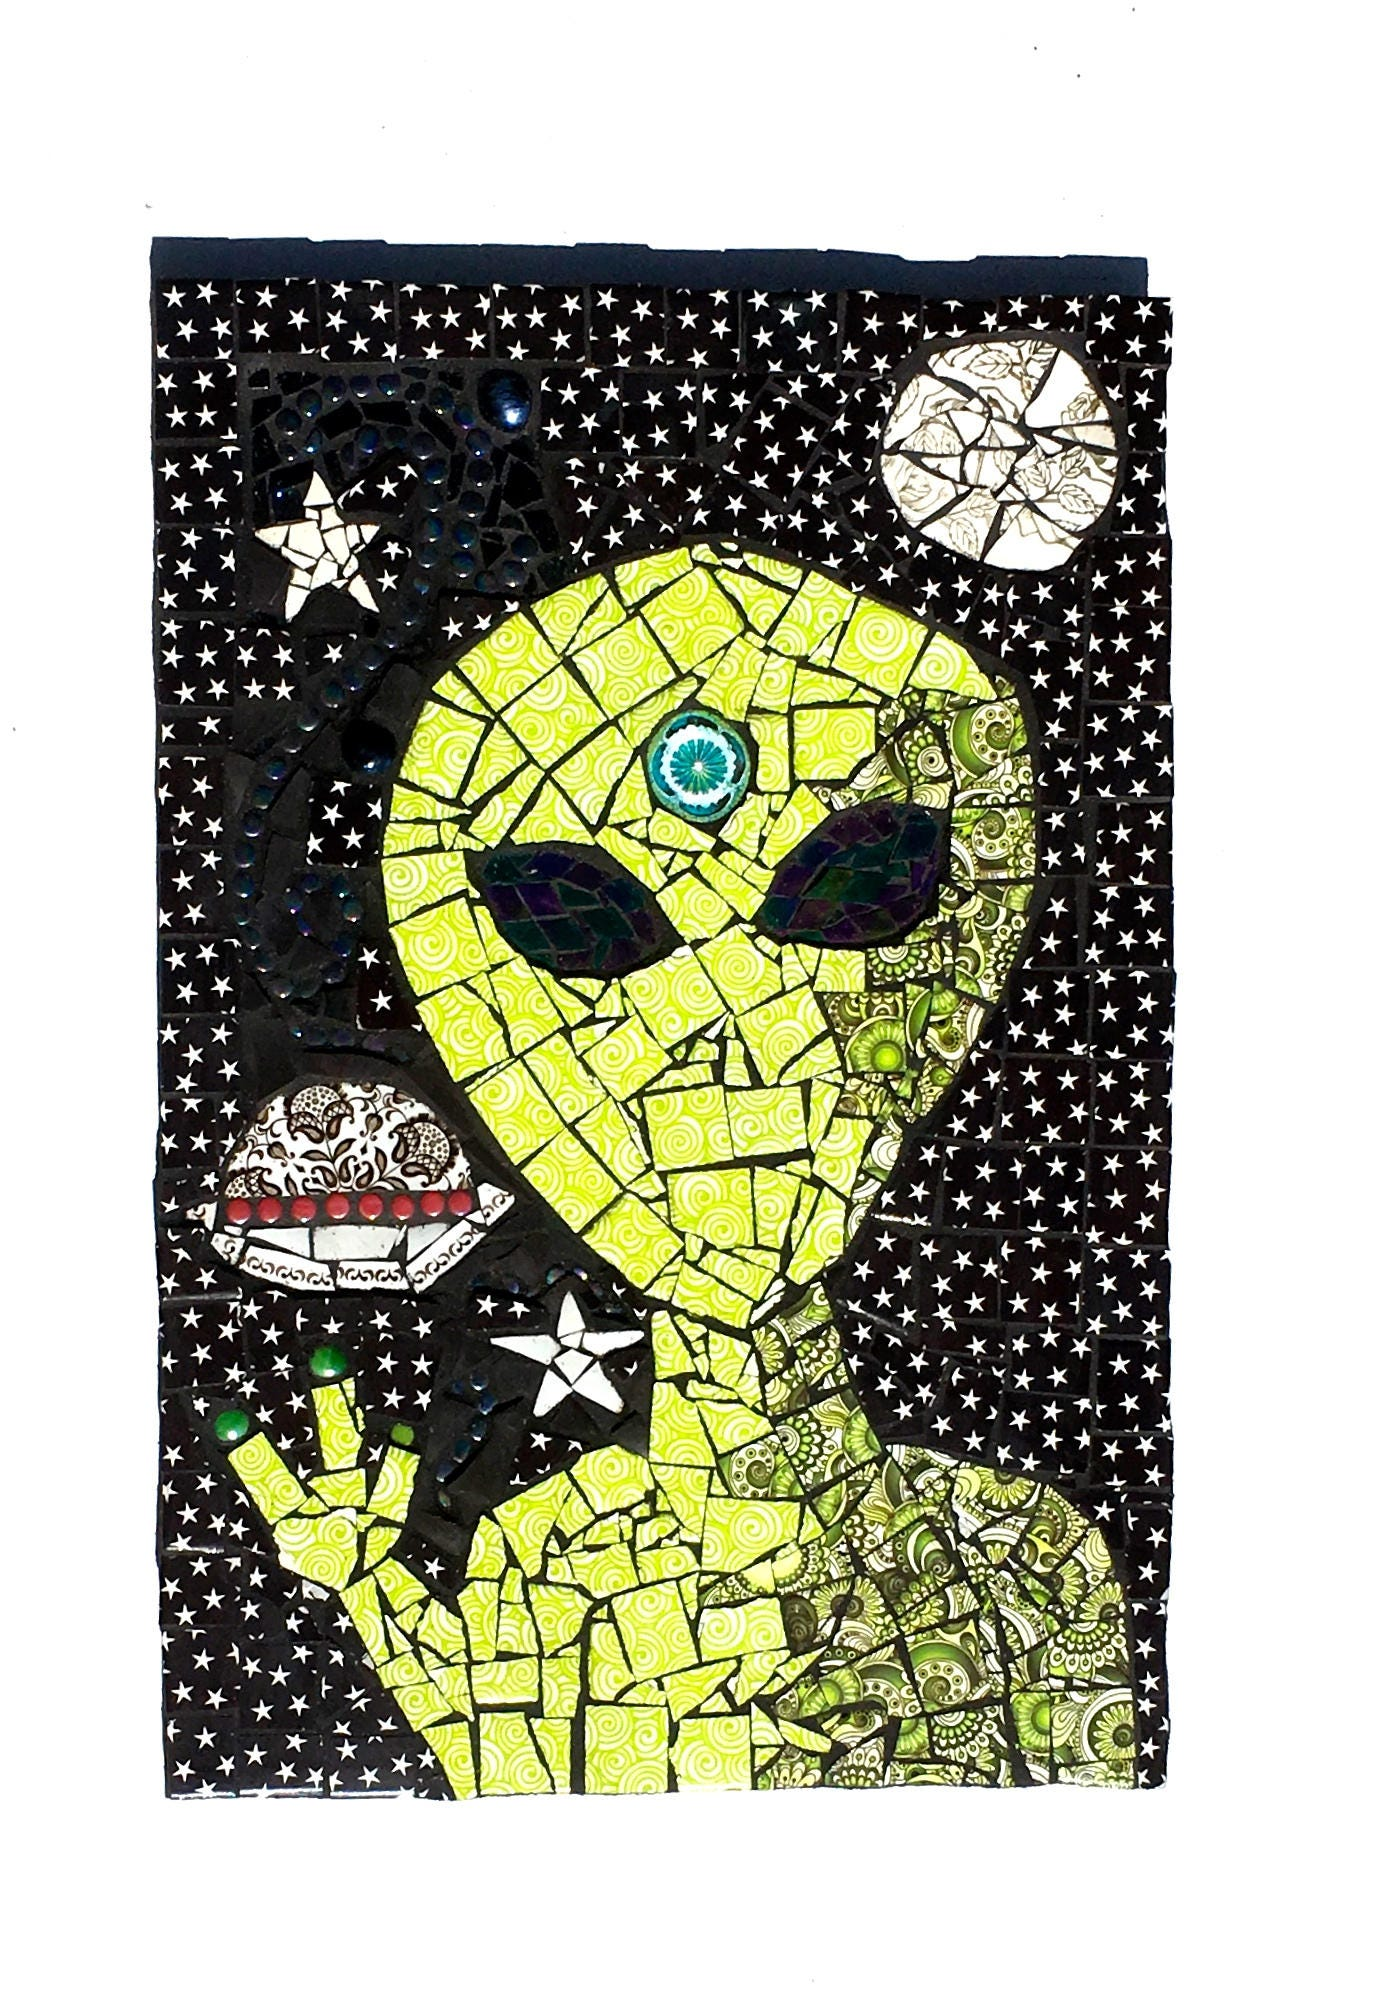 Alien Art Space Mosaic Weird Mixed Media UFO Decor Star | Etsy